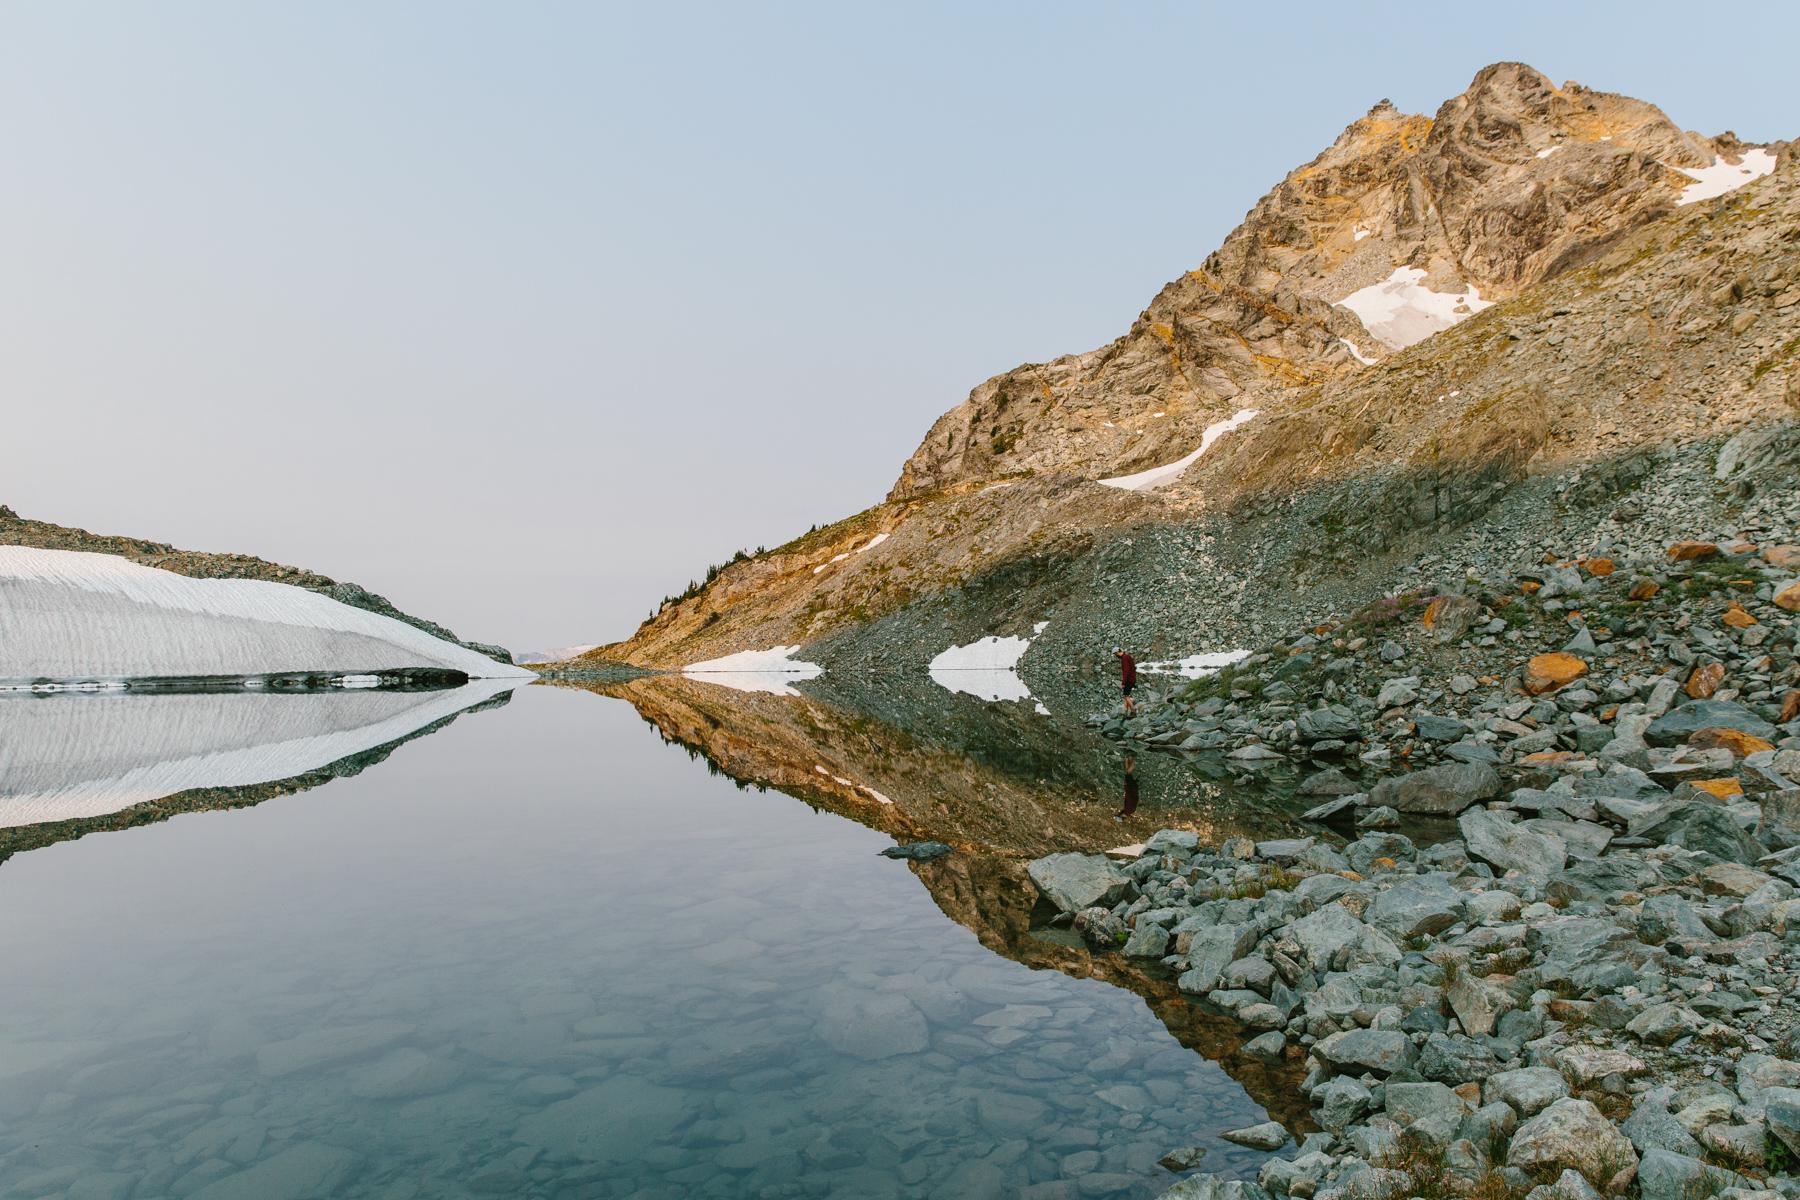 britishcolumbia-canada-lifestyle-photography-mikeseehagel-70